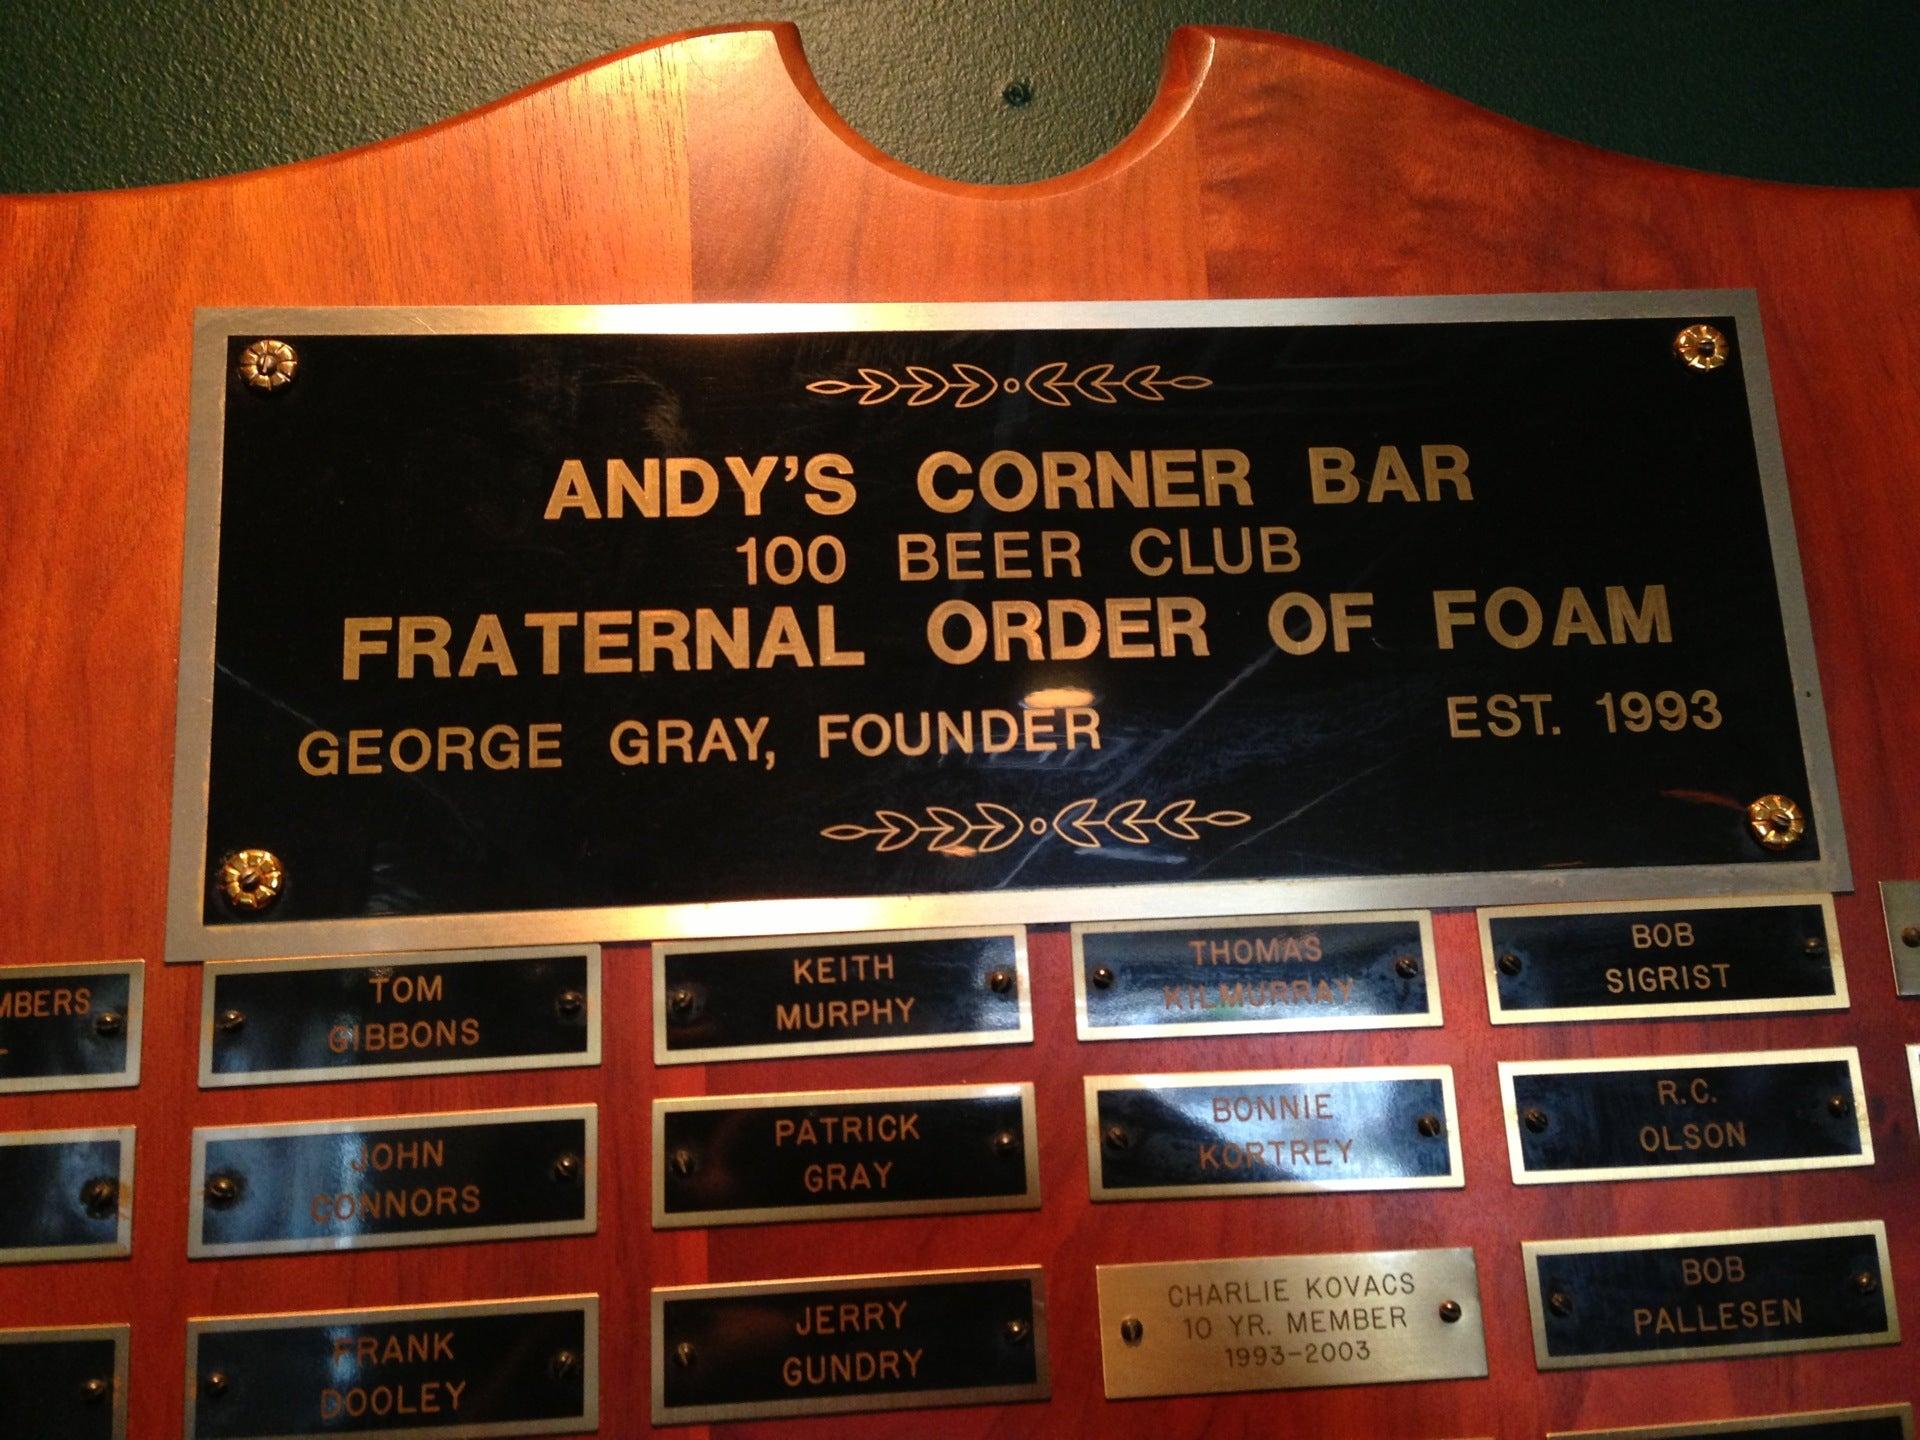 Andy's Corner Bar